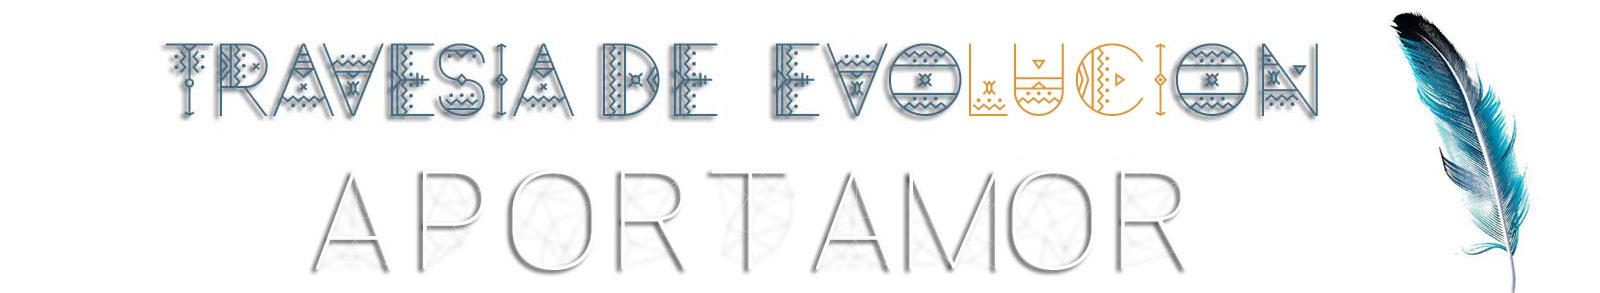 Travesia-de-Evolucion-Metamorfosis-y-Libertad-AportAmor-1